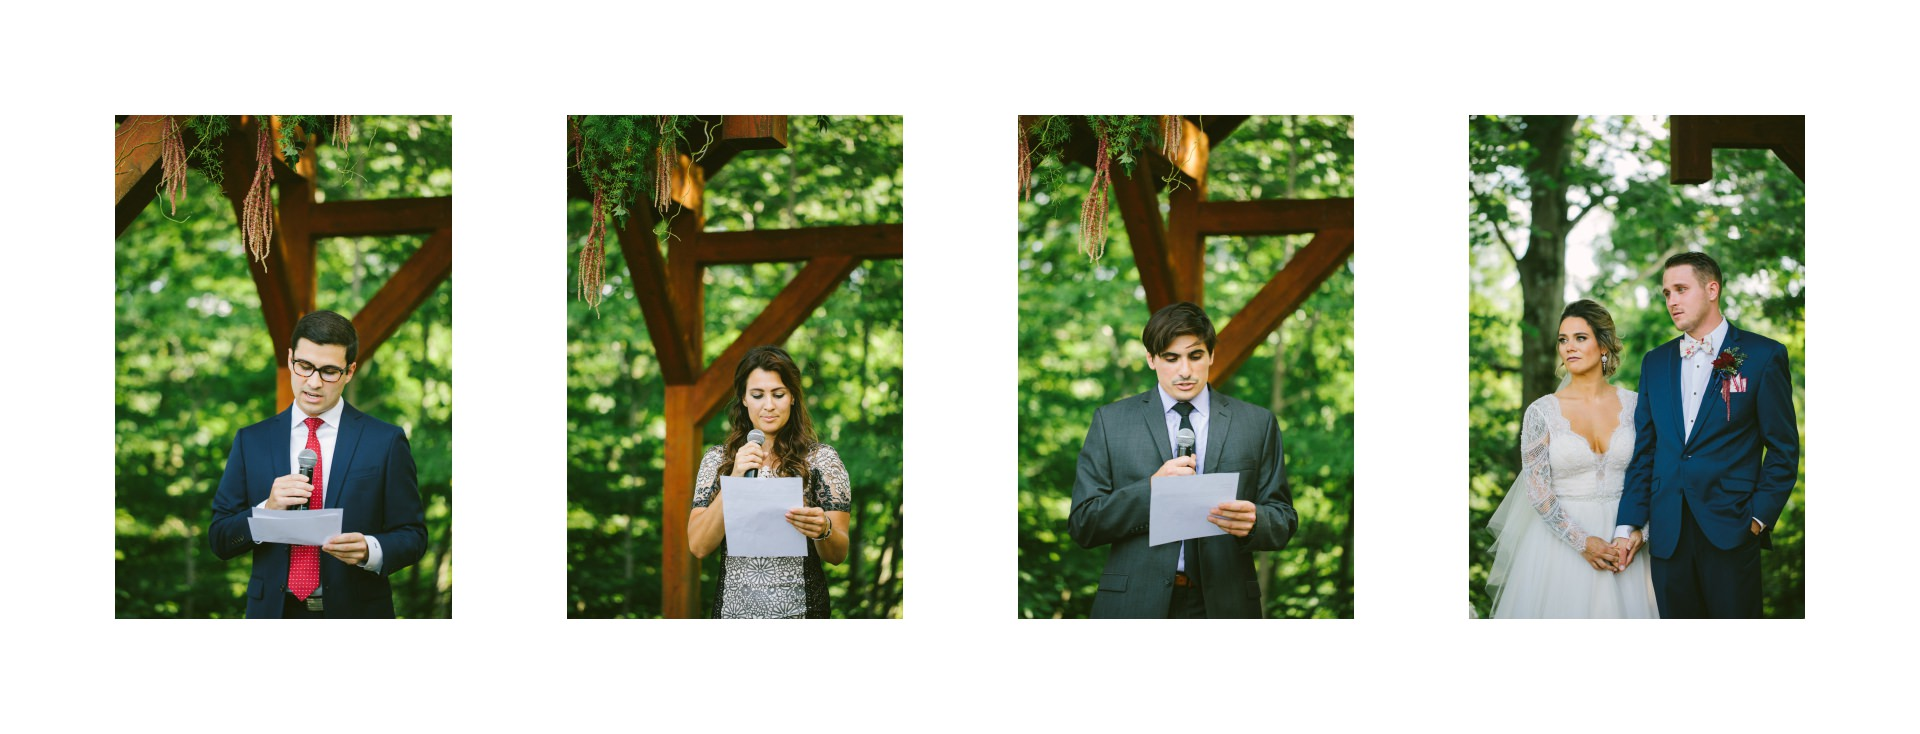 Meadow Ridge Farm Wedding Photos in Windsor 2 25.jpg